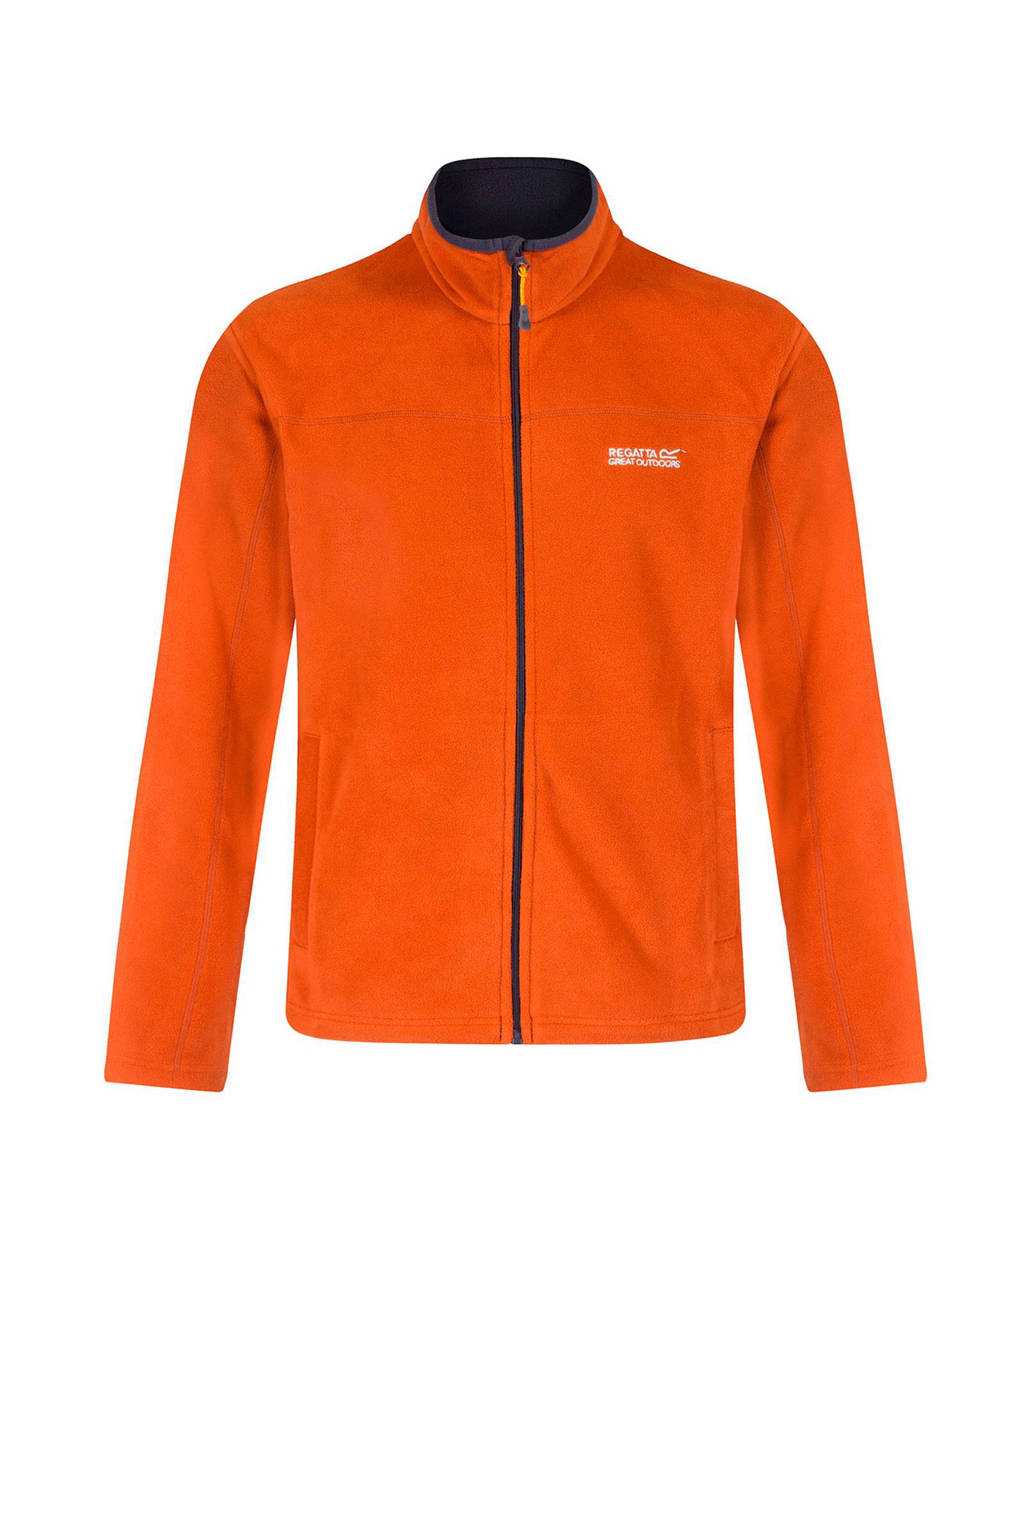 Regatta   Fairview outdoor fleecevest oranje, Oranje